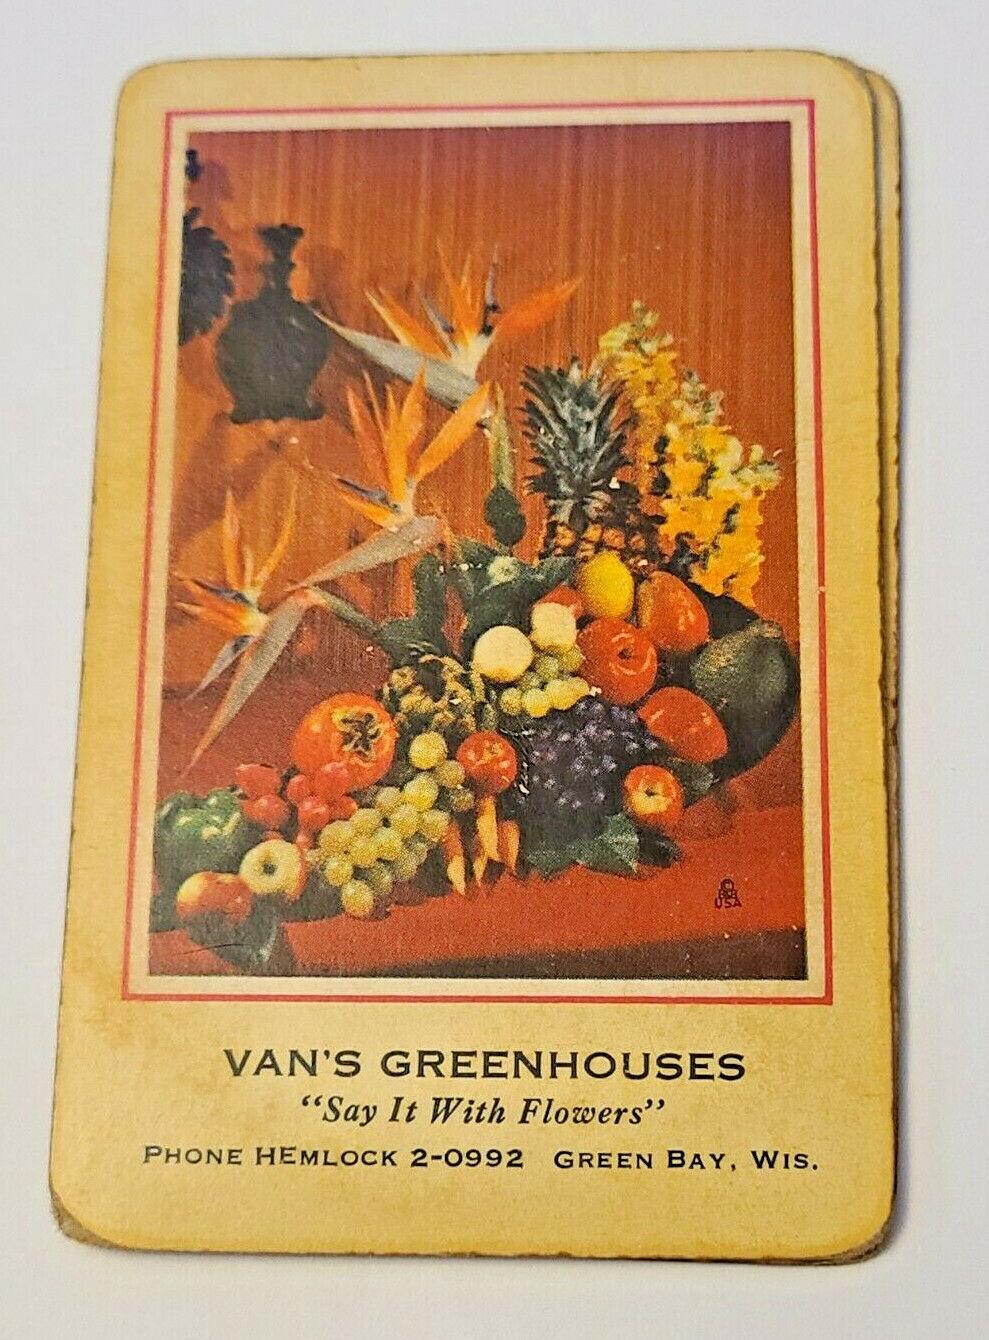 Vintage Retro Redislip Playing Cards Floral Centerpiece Van's Greenhouses  (003)